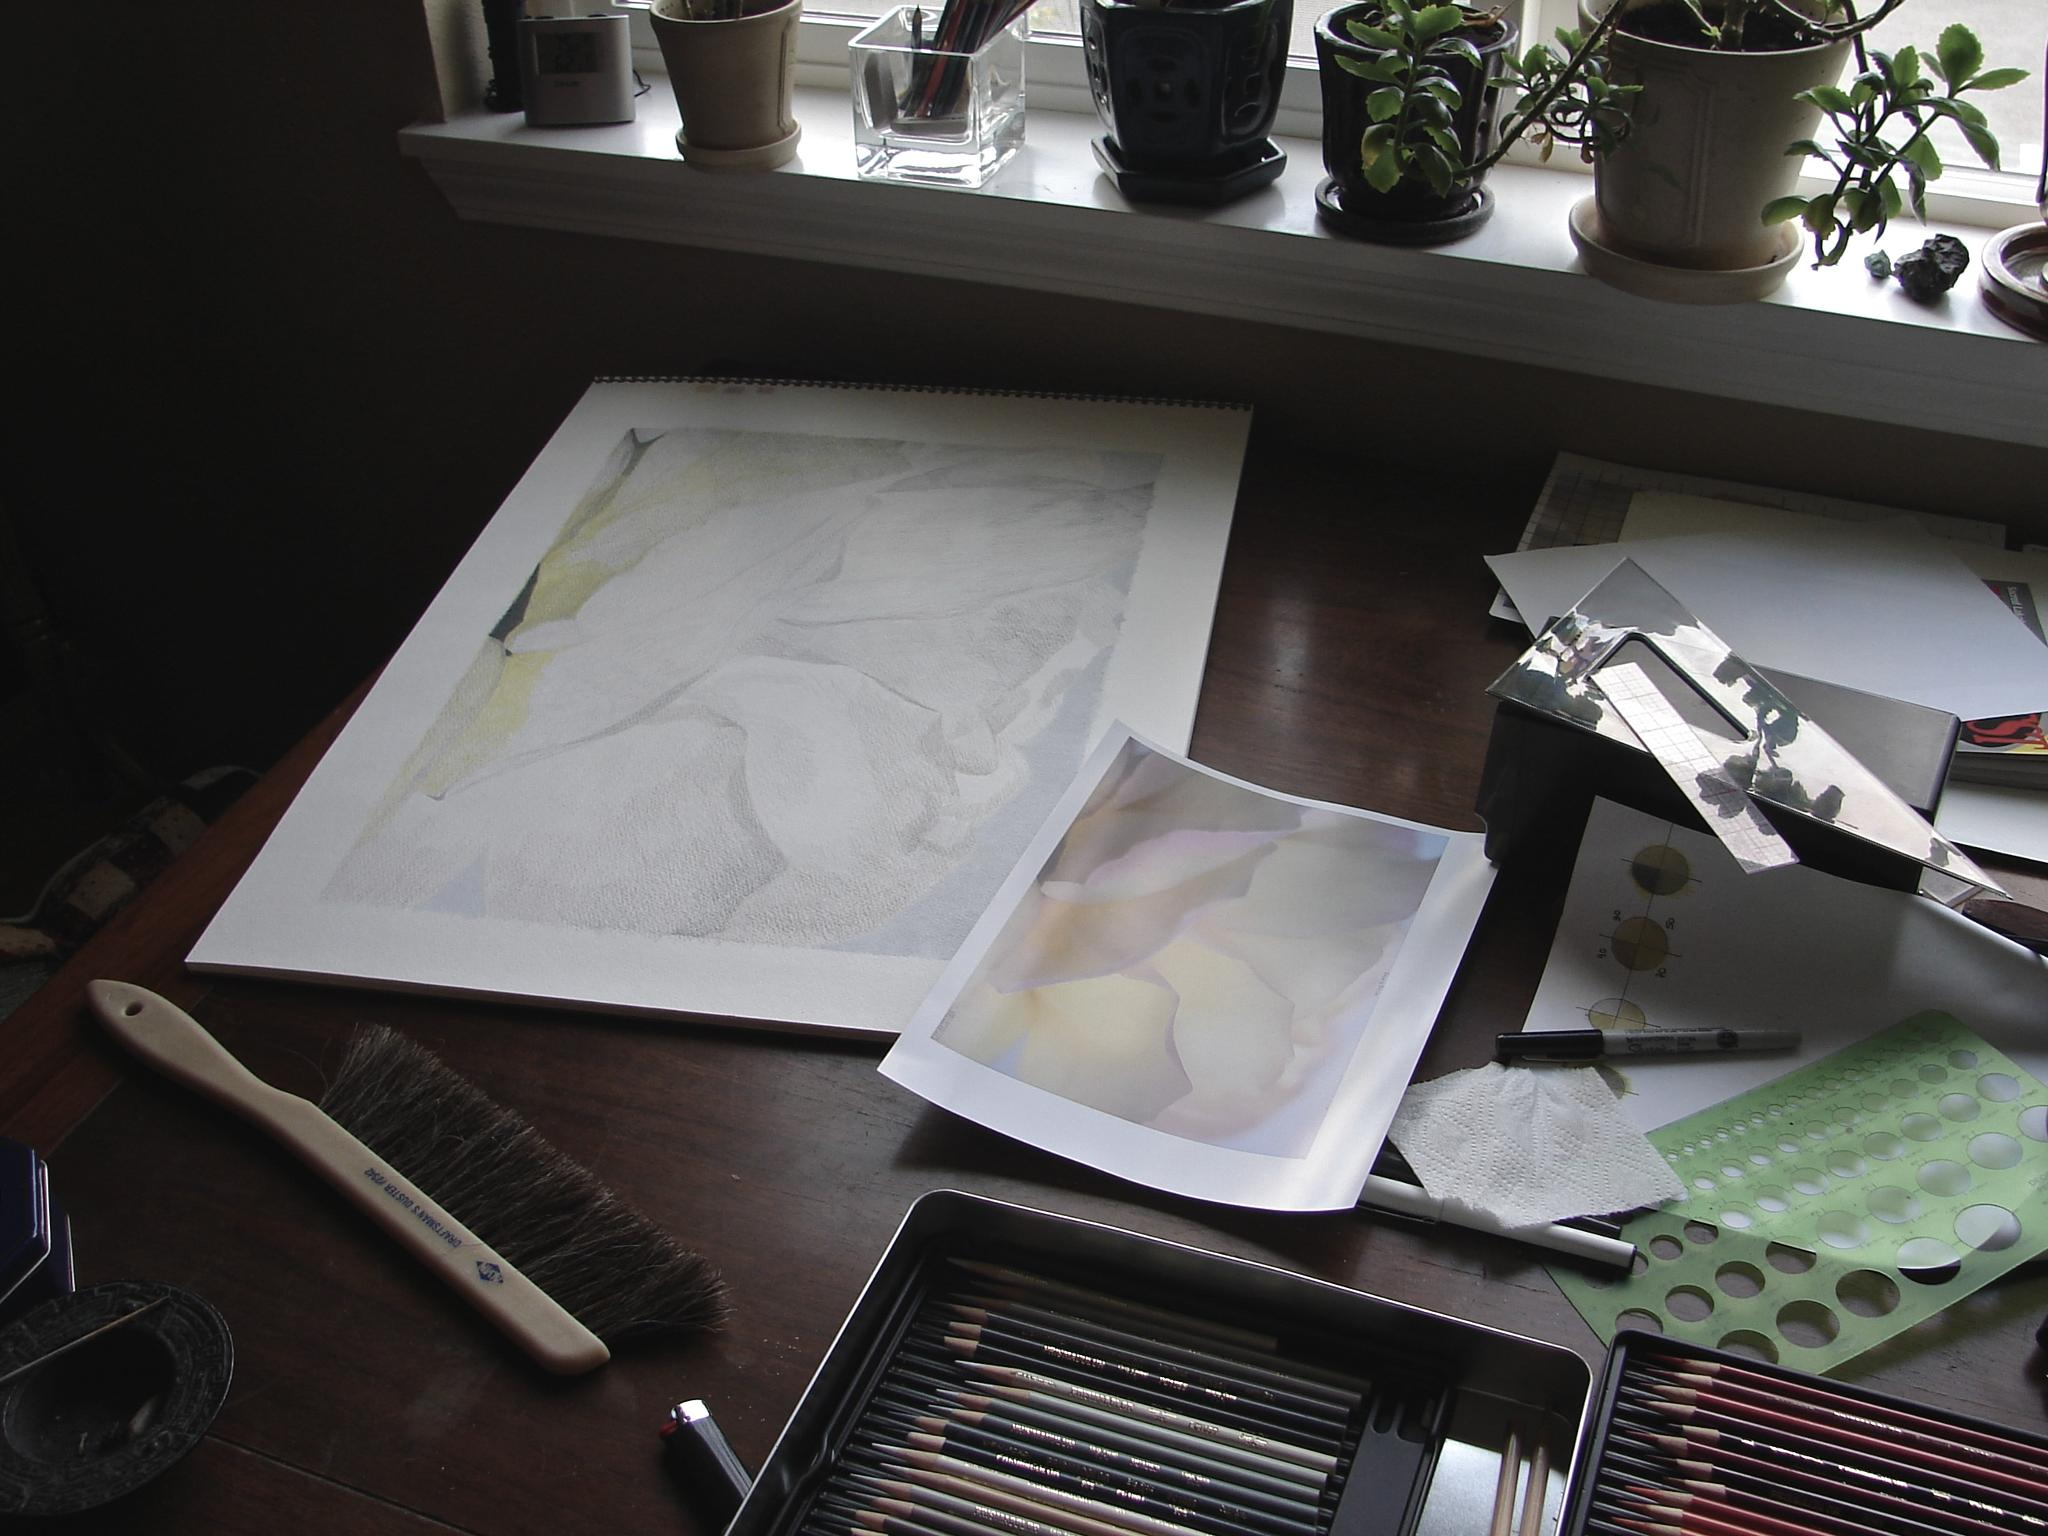 The Artist's Table by MelanieAnnePhillips